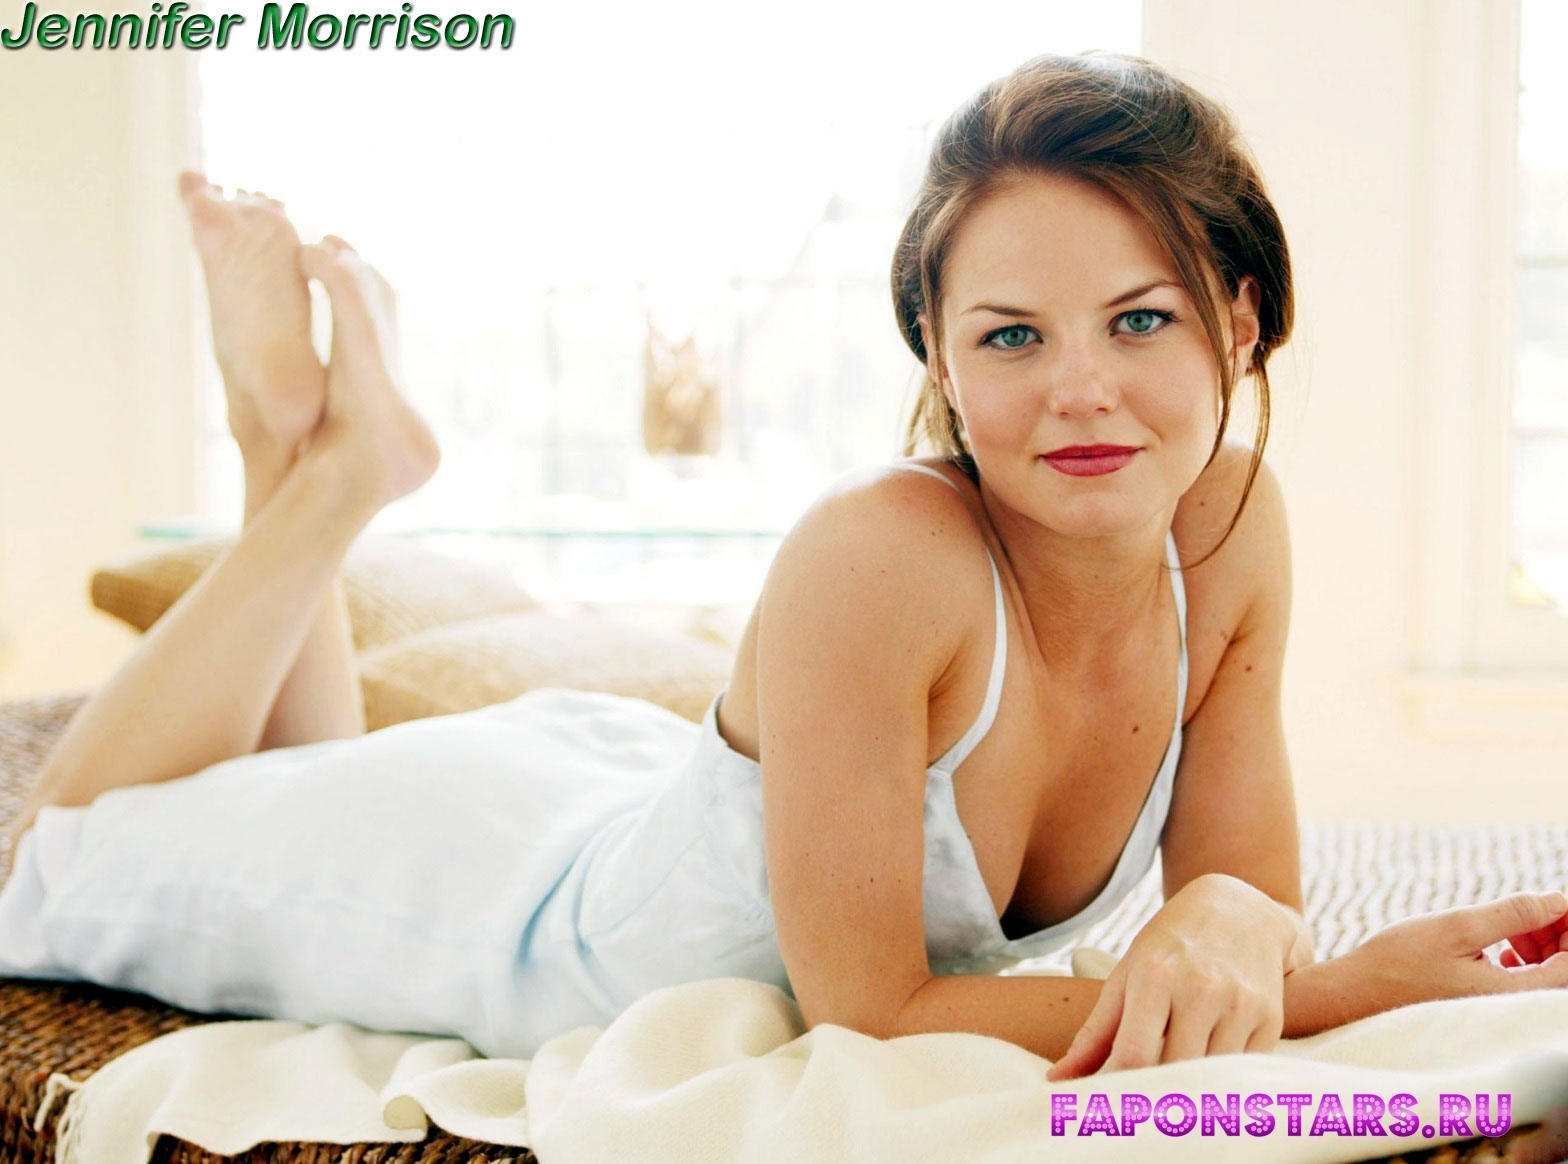 Jennifer Morrison / Дженнифер Моррисон неудачное фото